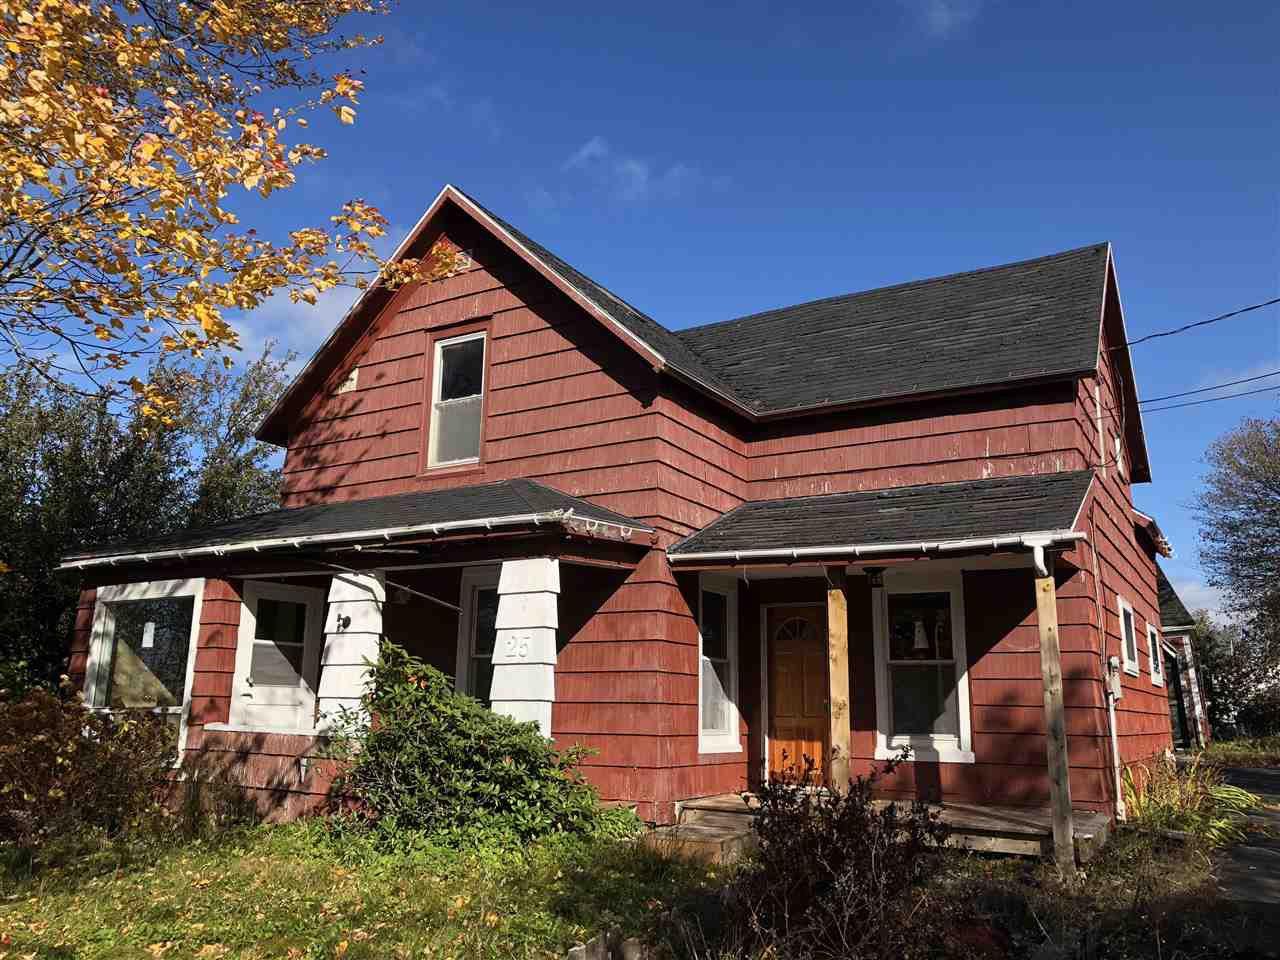 Main Photo: 25 Mechanic Street in Trenton: 107-Trenton,Westville,Pictou Residential for sale (Northern Region)  : MLS®# 201918404